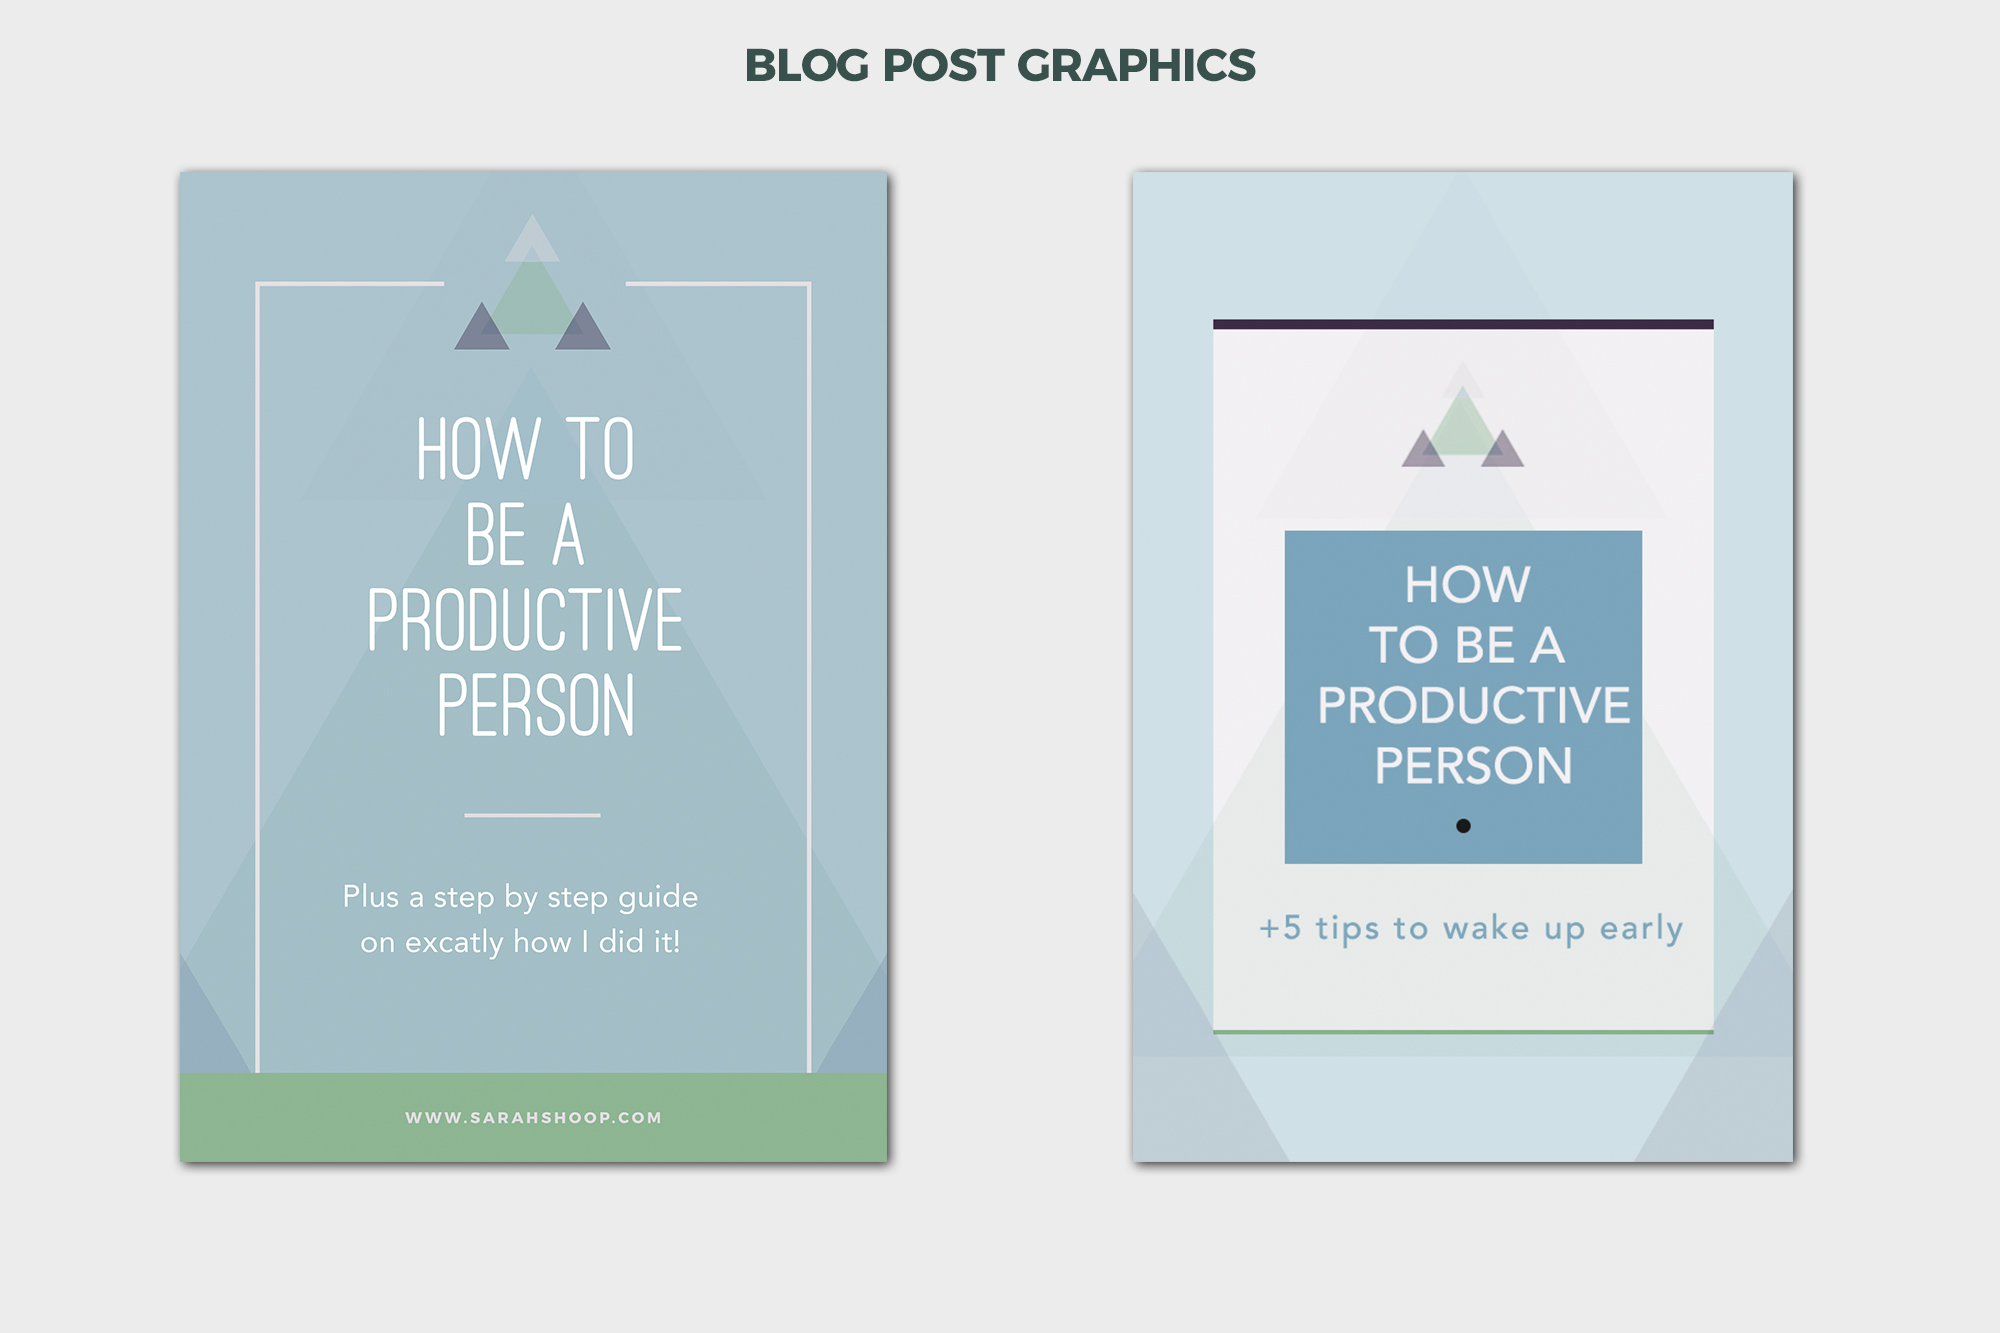 blog-post-graphics.jpg